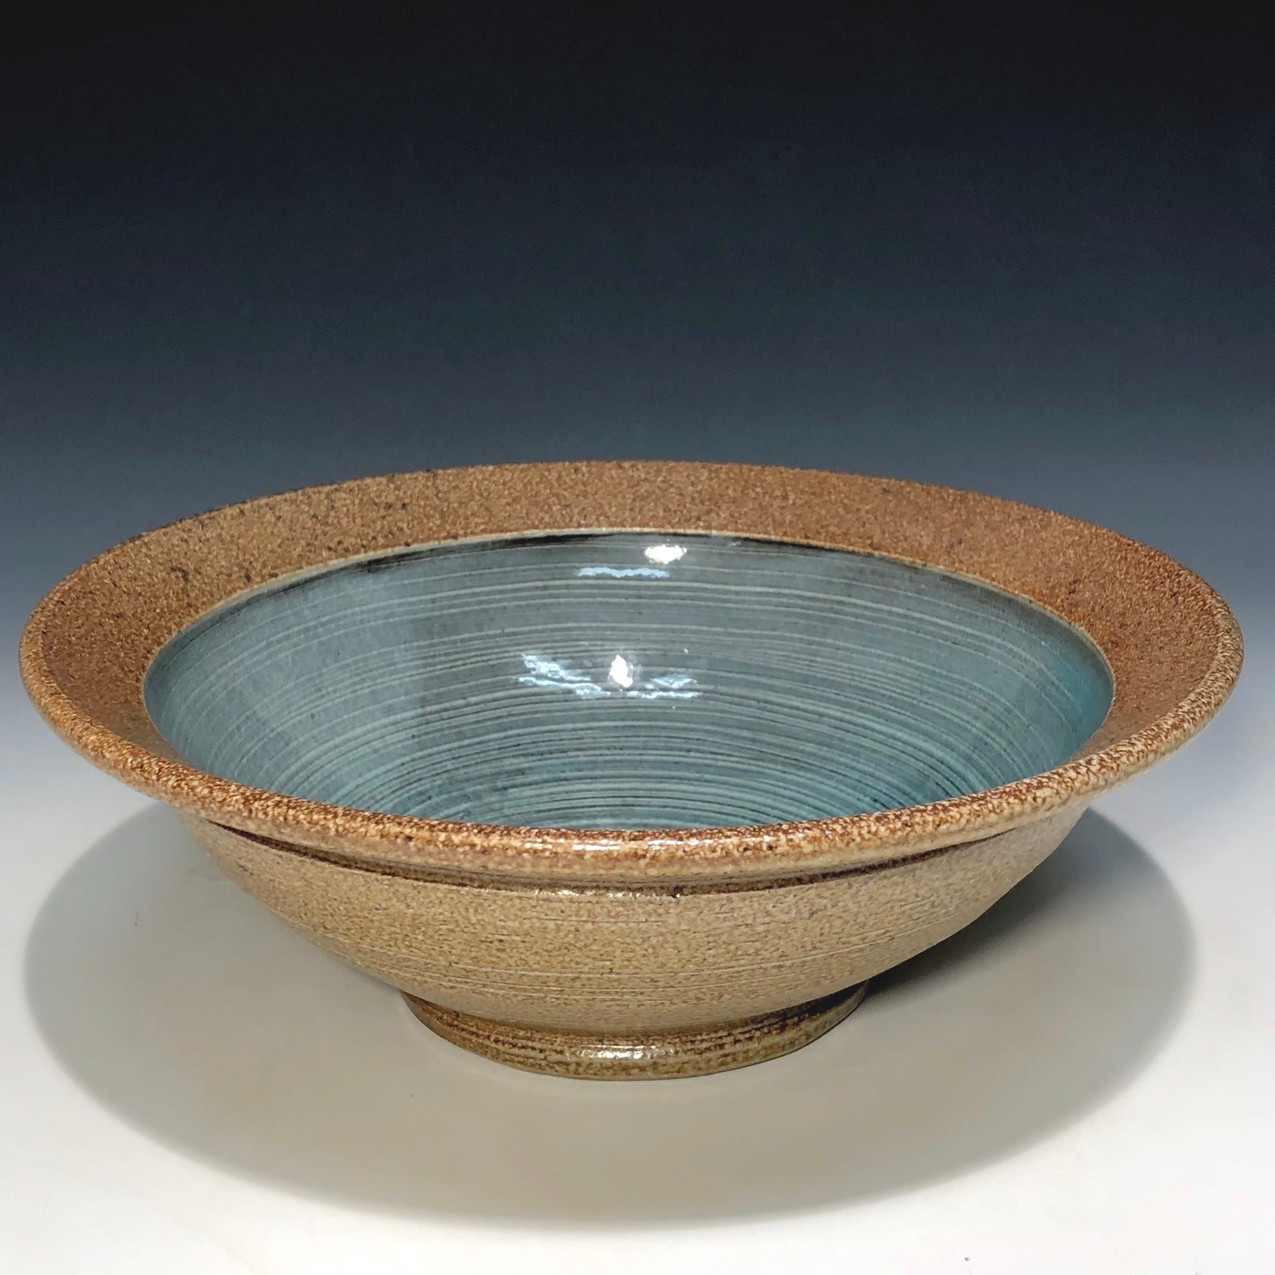 Crystal's Bowl